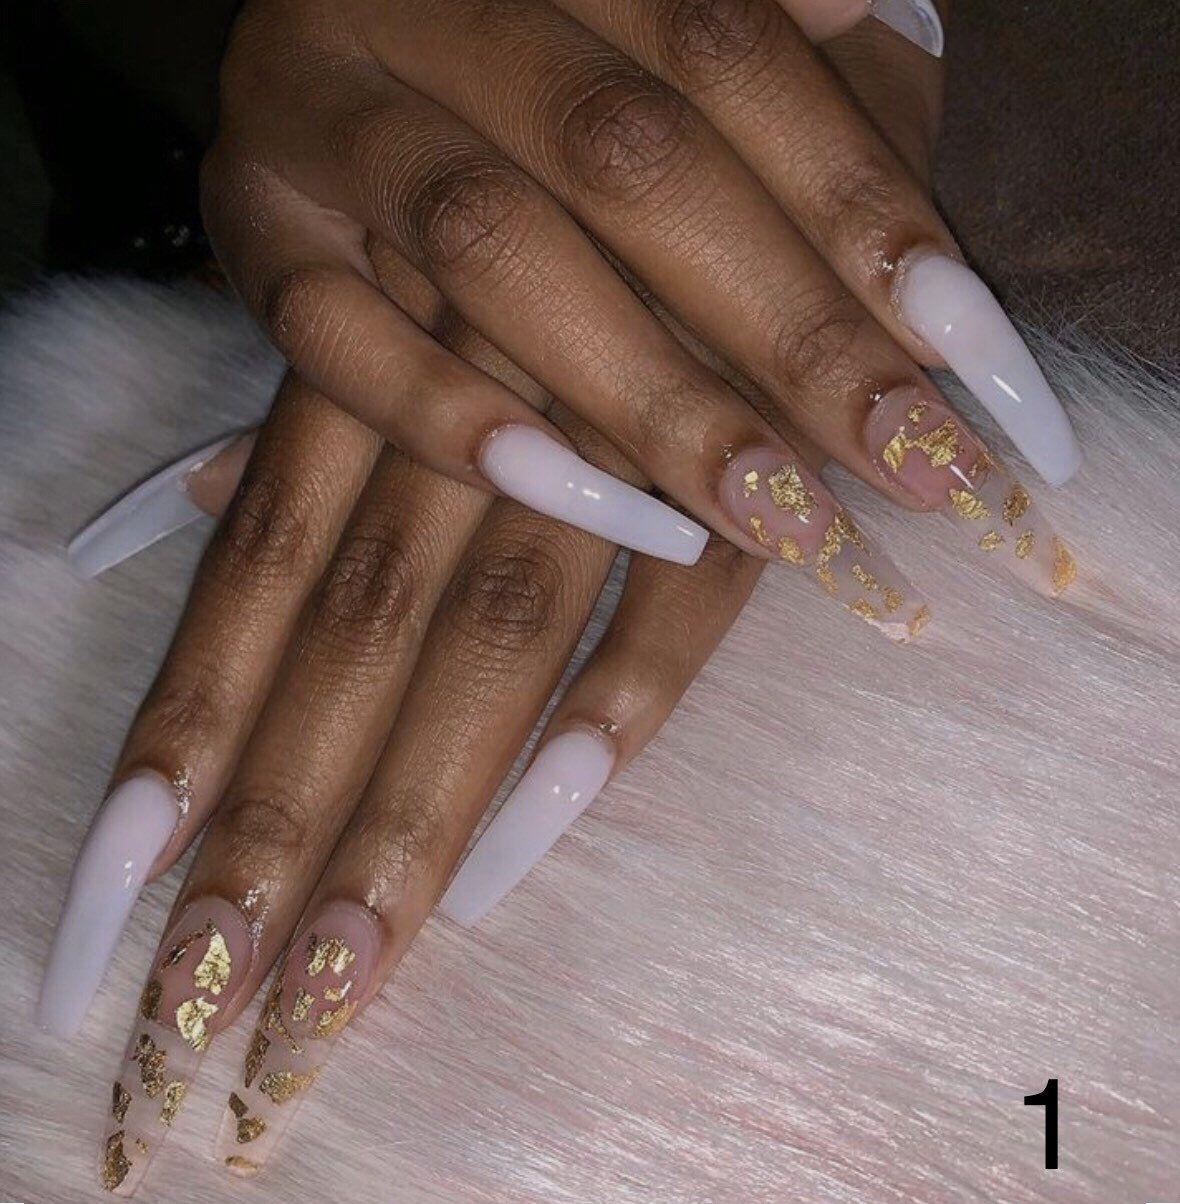 Custom Press On Acrylic Nails Set Of 10 Any Size Shape Gel Polish Comes With Glue Fake Nails Reusable Acrylic Nail Set Long Acrylic Nails Pretty Acrylic Nails